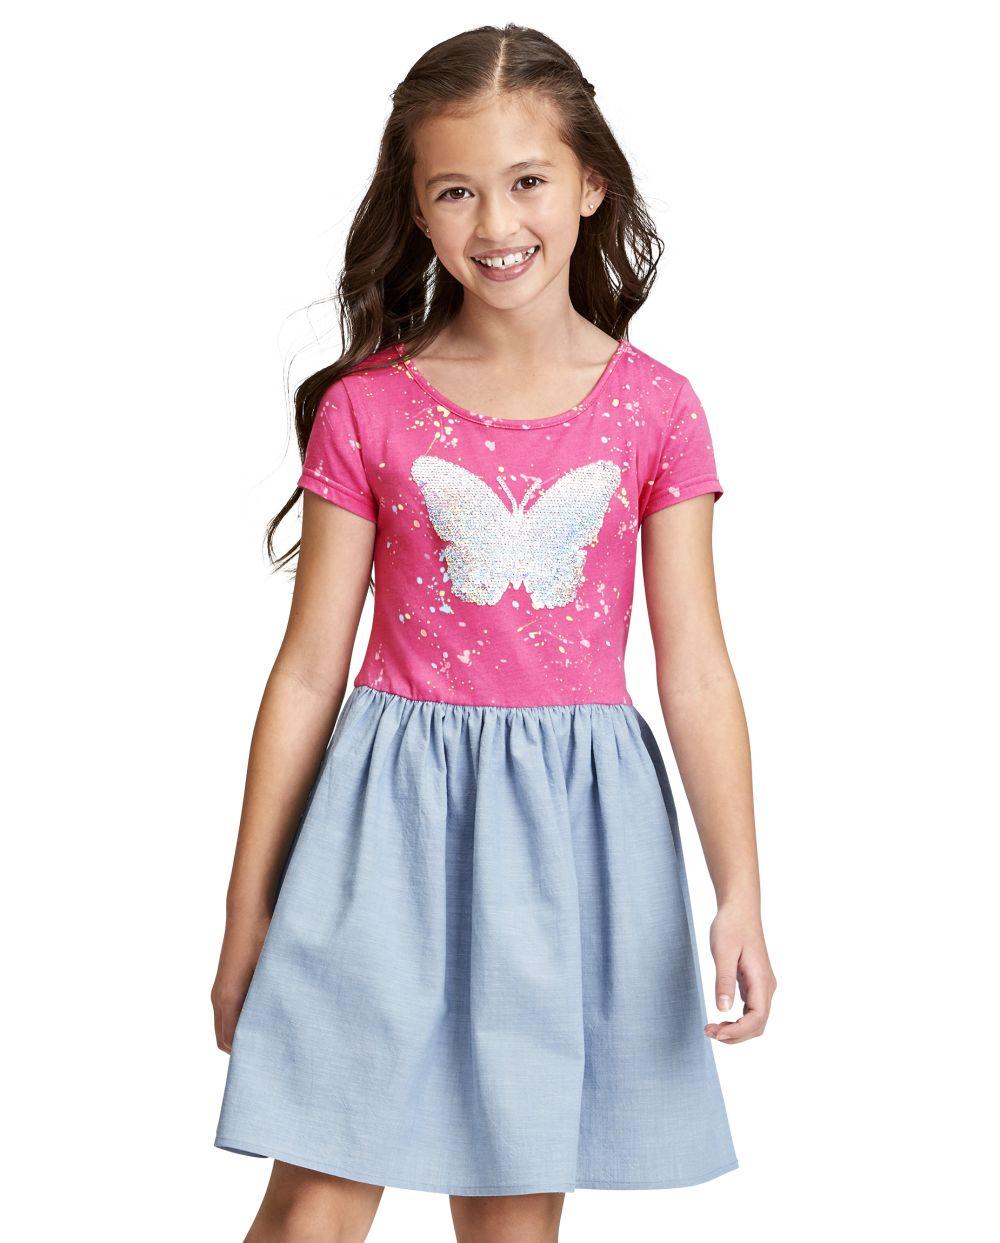 Girls Flip Sequin Butterfly Knit To Woven Dress - Pink